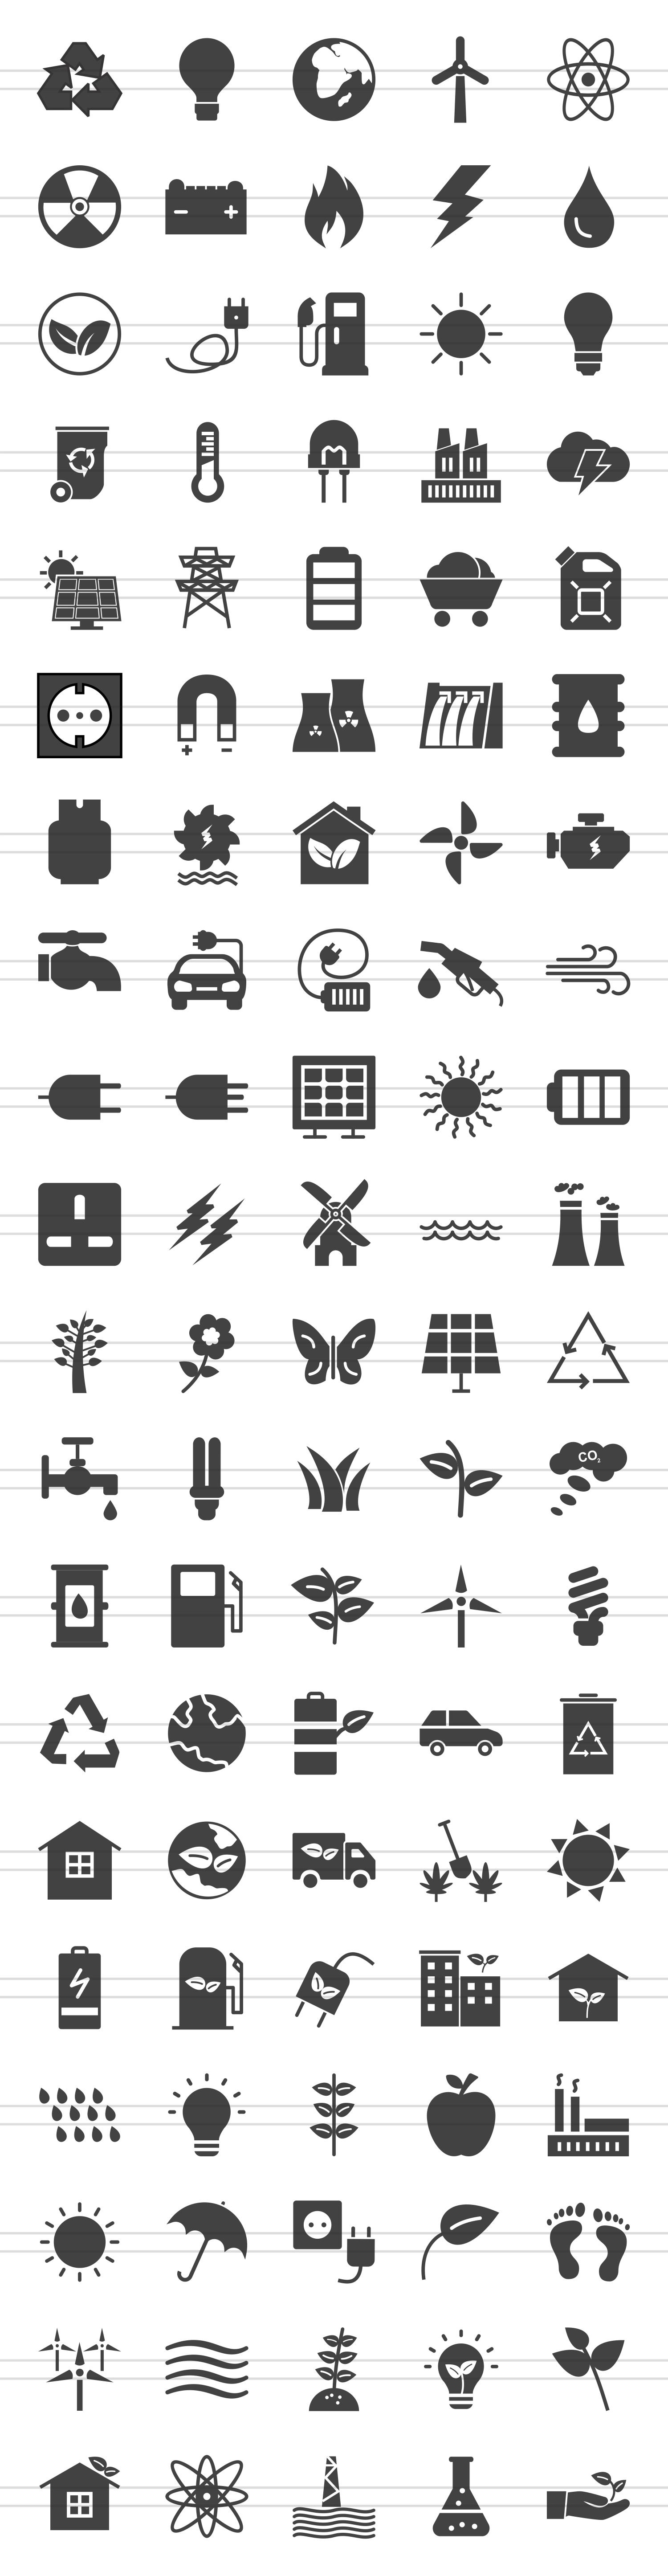 100 Energy Glyph Icons example image 2